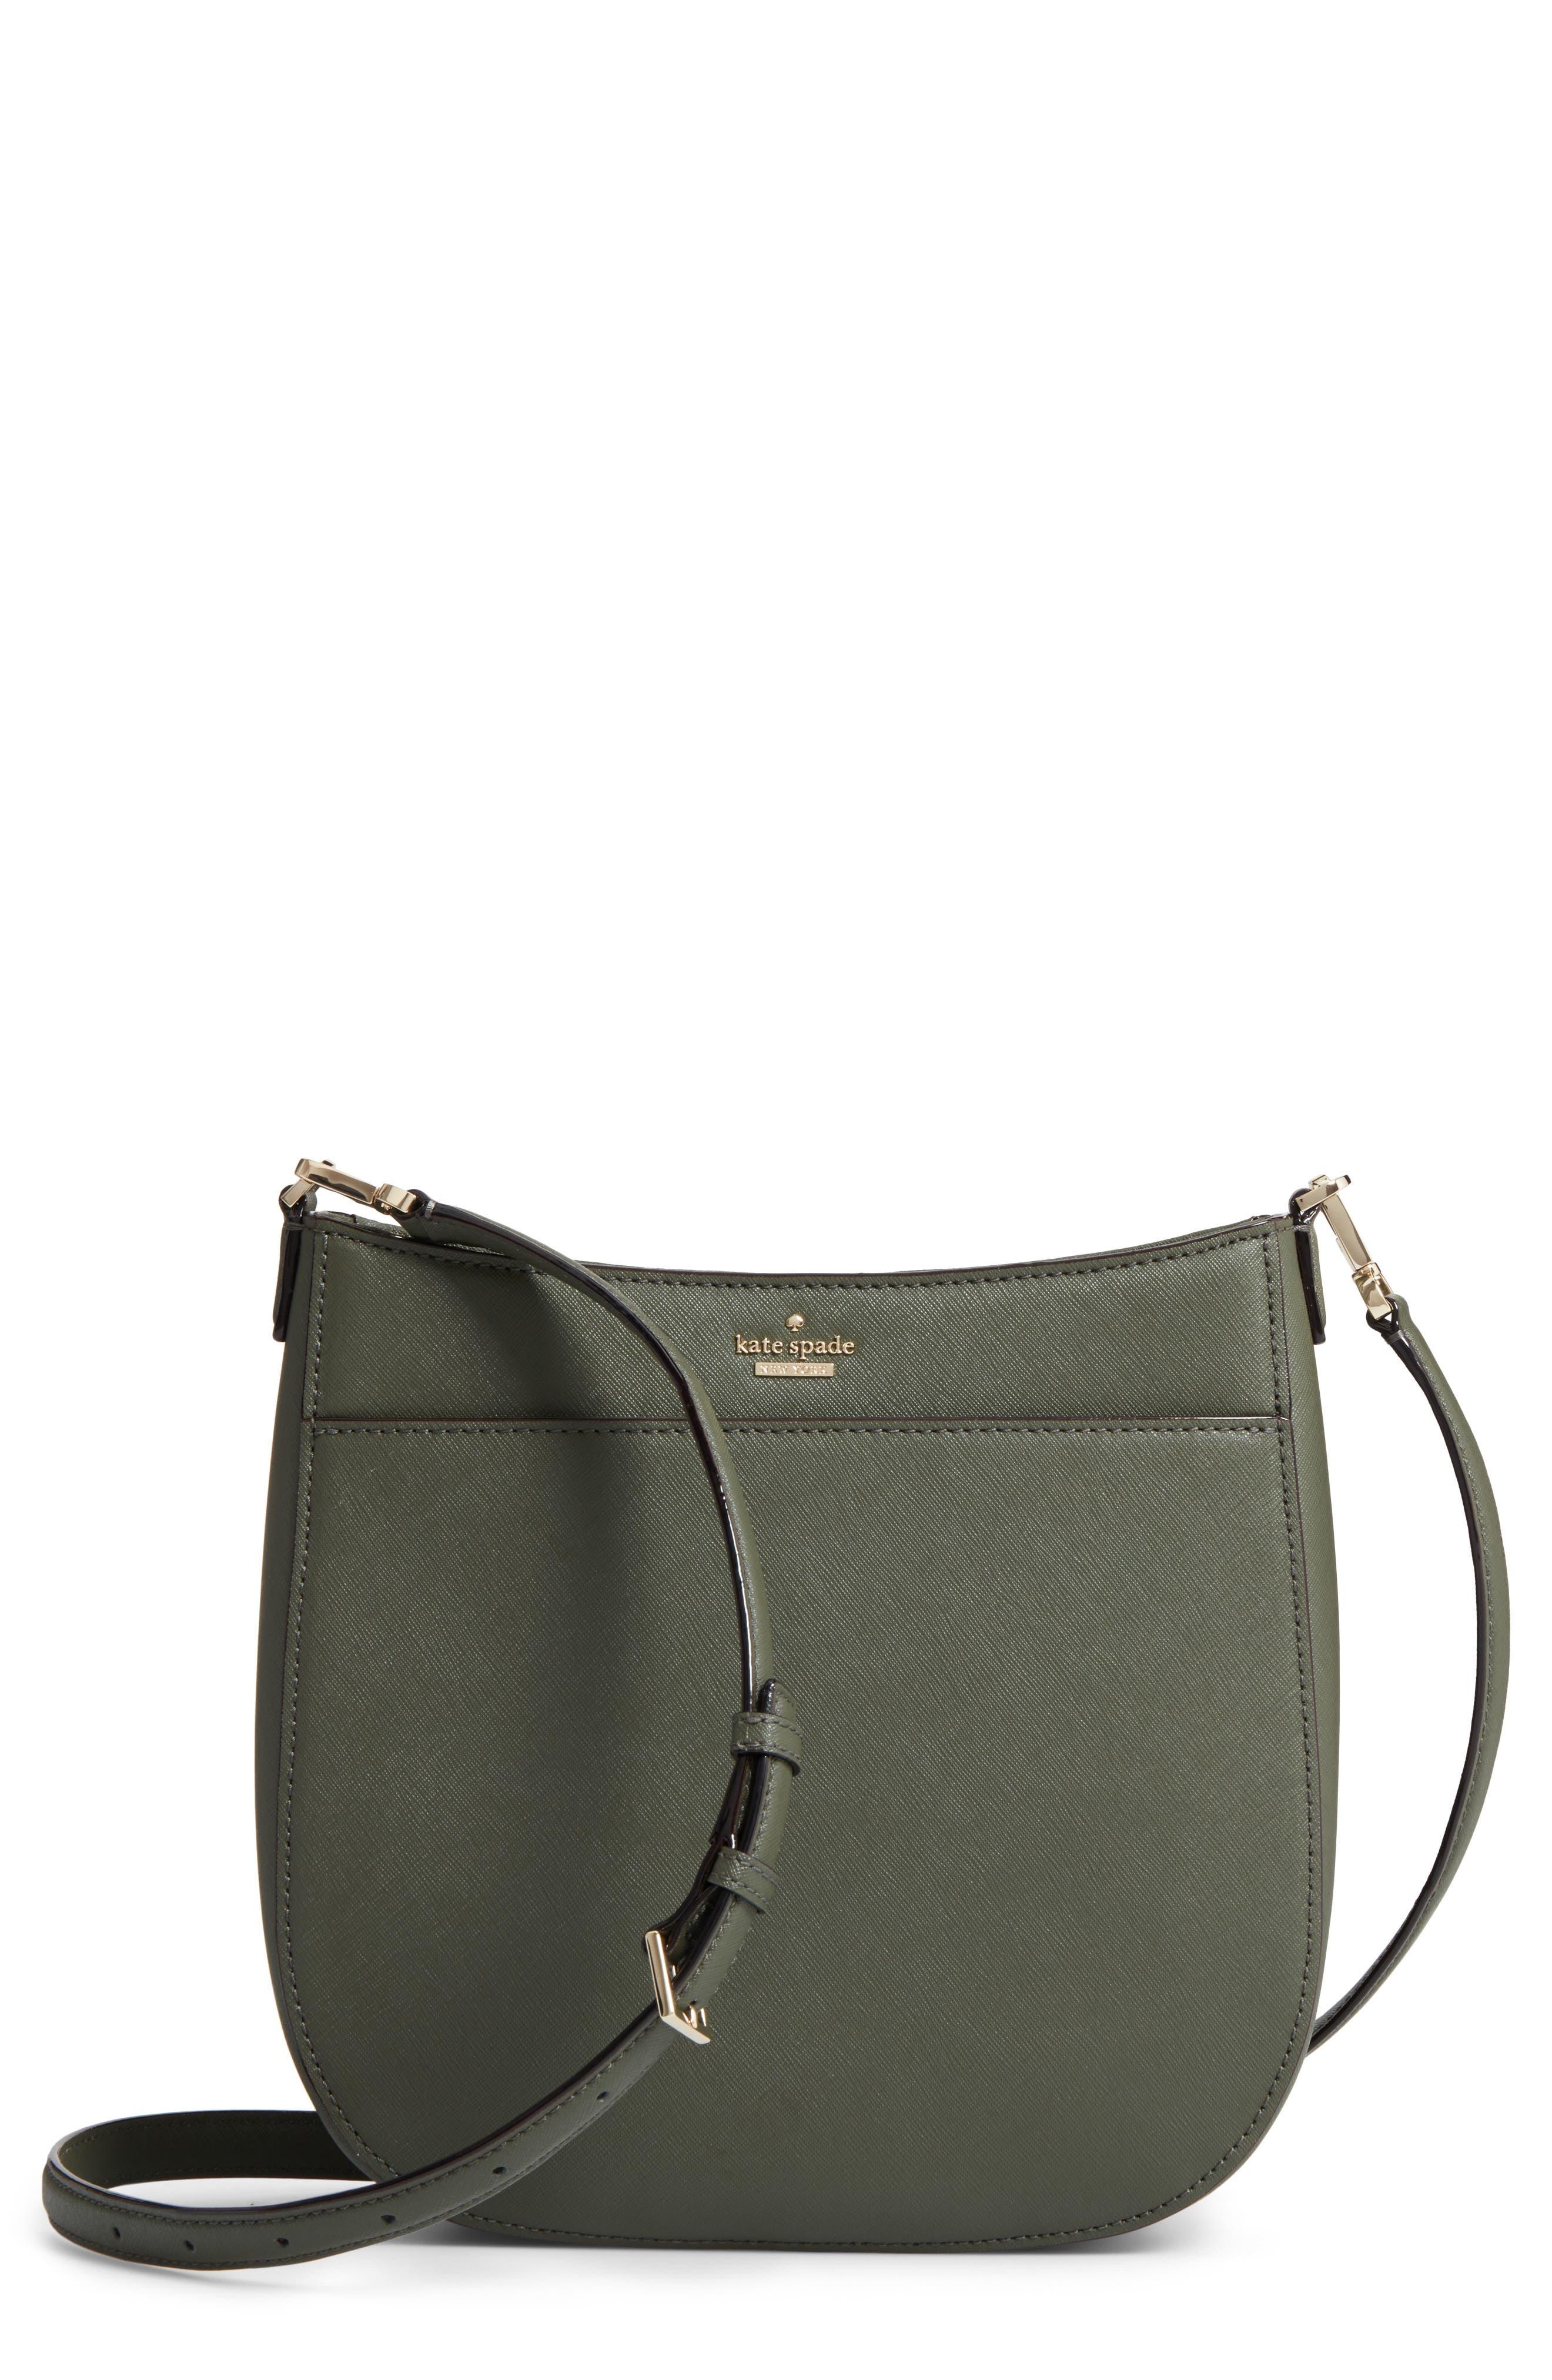 kate spade new york cameron street - robin leather crossbody bag (Nordstrom Exclusive)